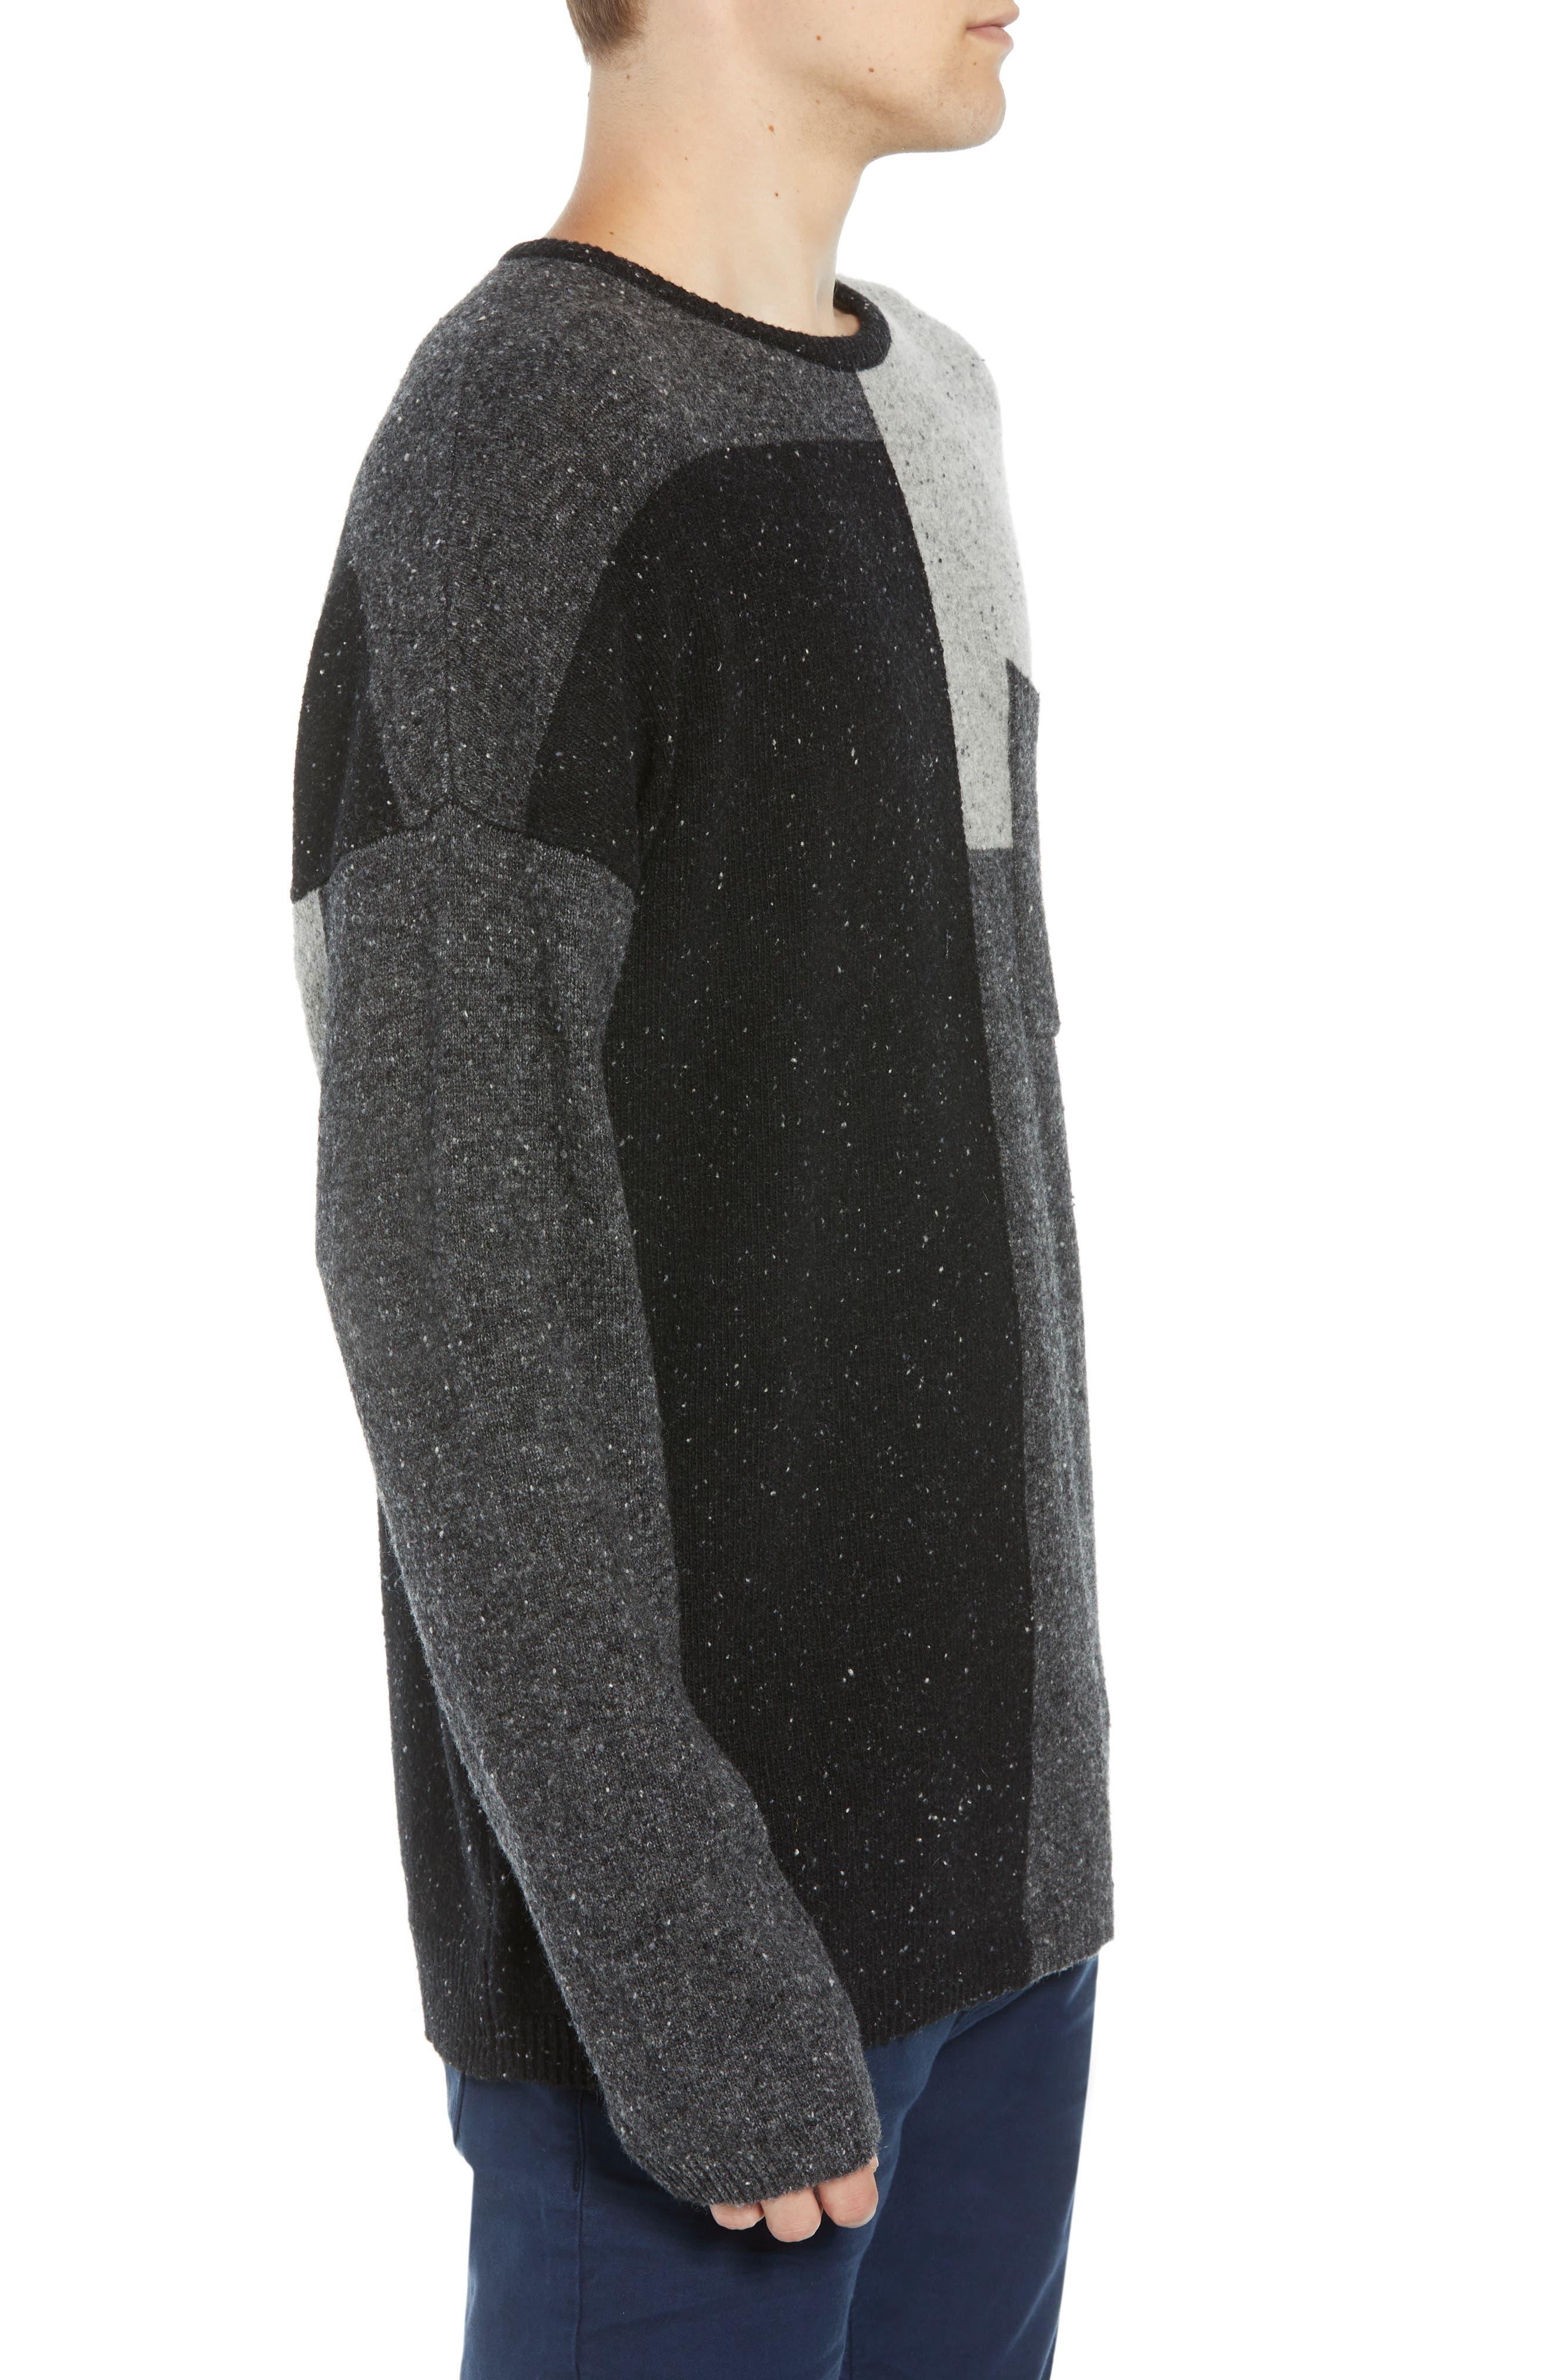 Patchwork Donegal Wool Blend Sweater,                             Alternate thumbnail 3, color,                             LIGHT GREY MELANGE CHARCOAL